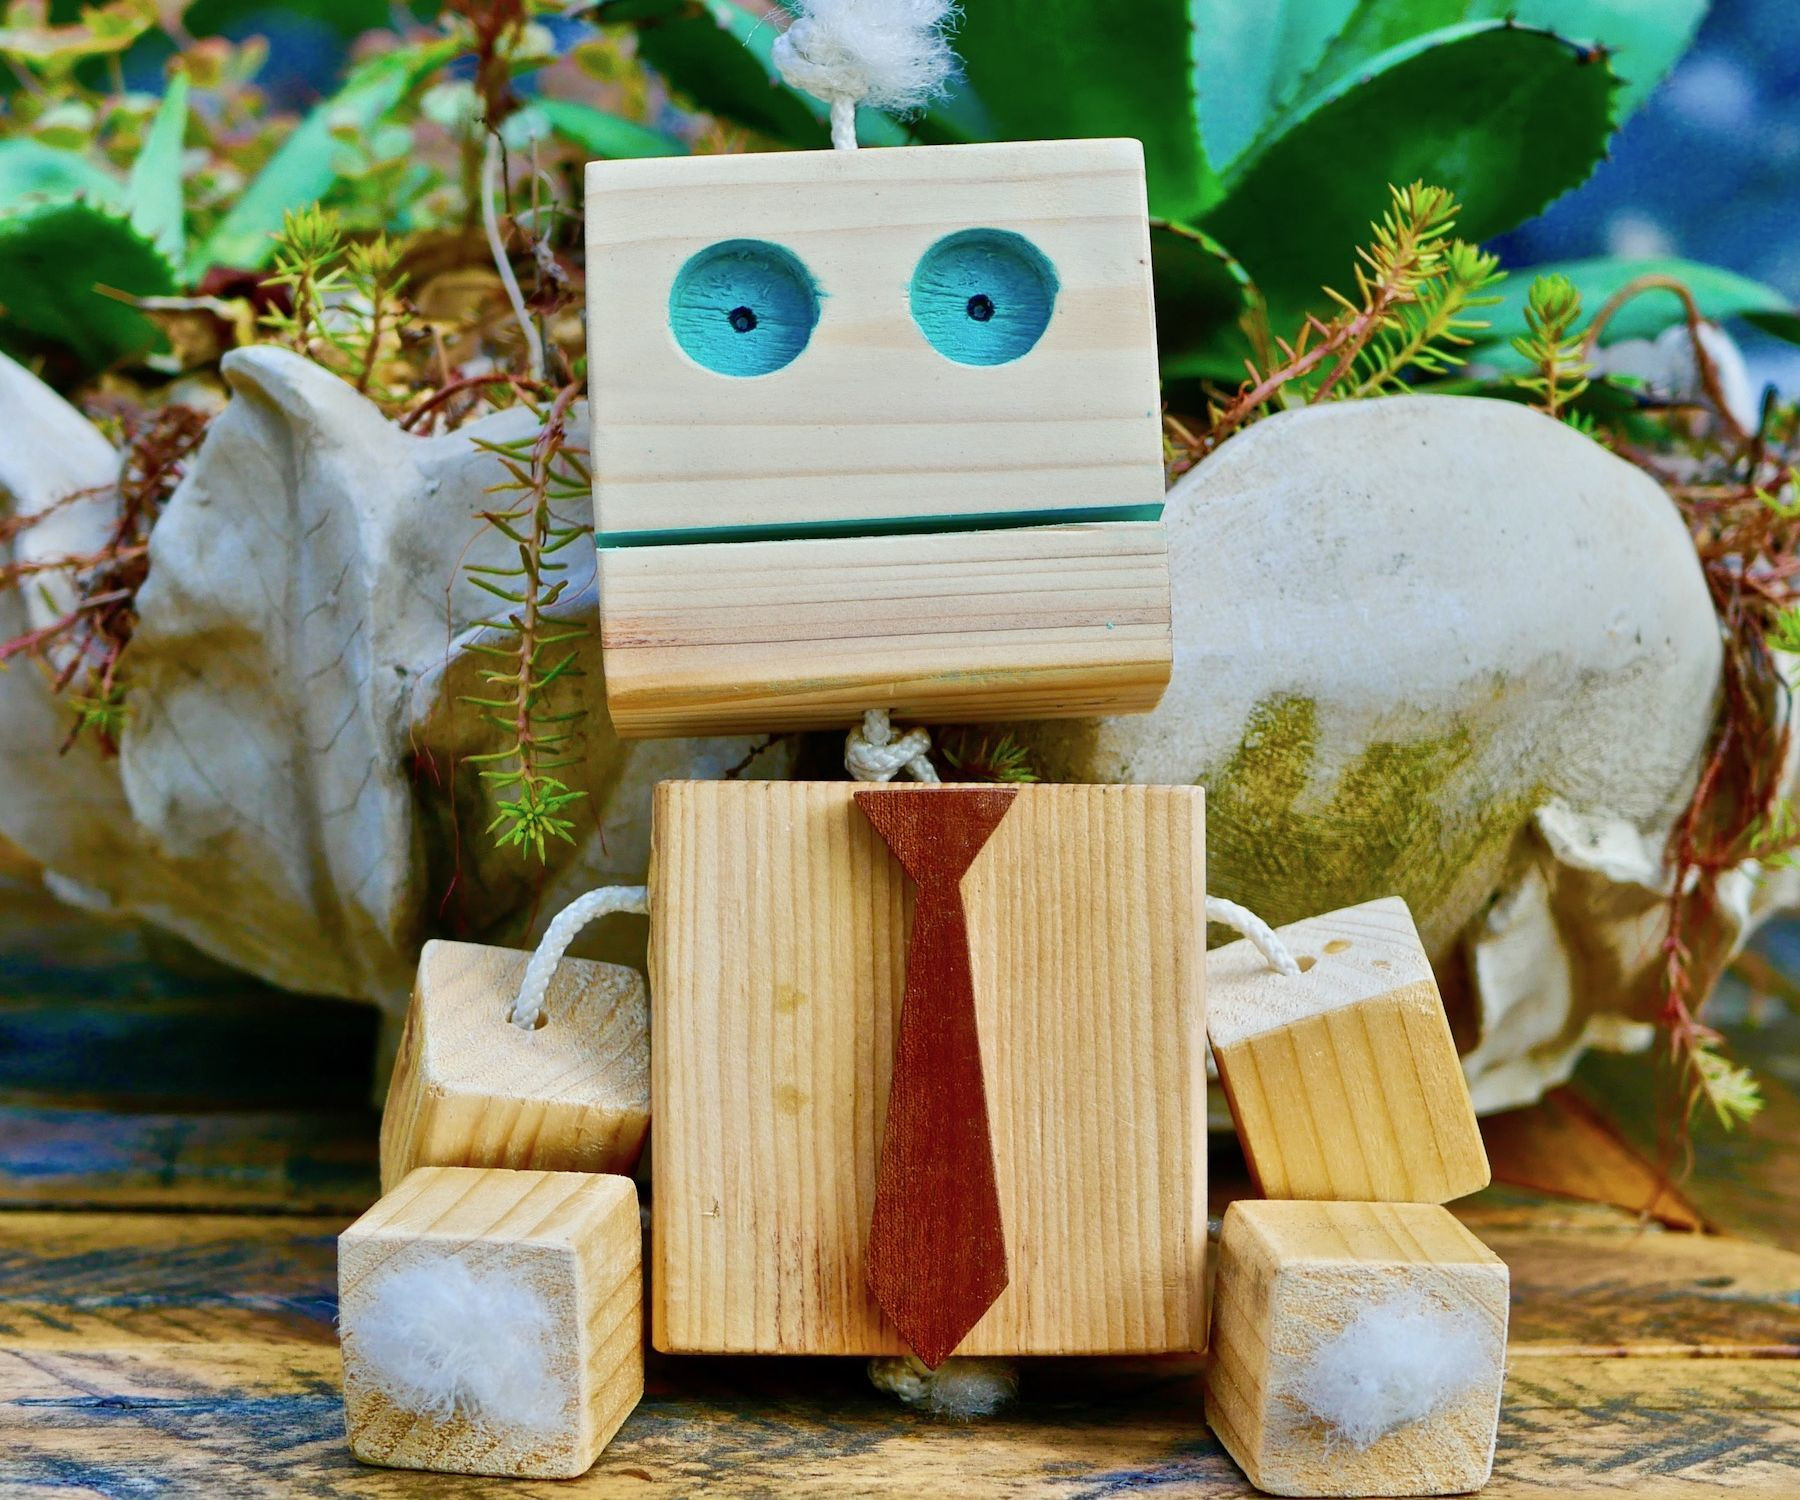 DIY Wood Toys  Wooden Robot DIY Homemade Toy